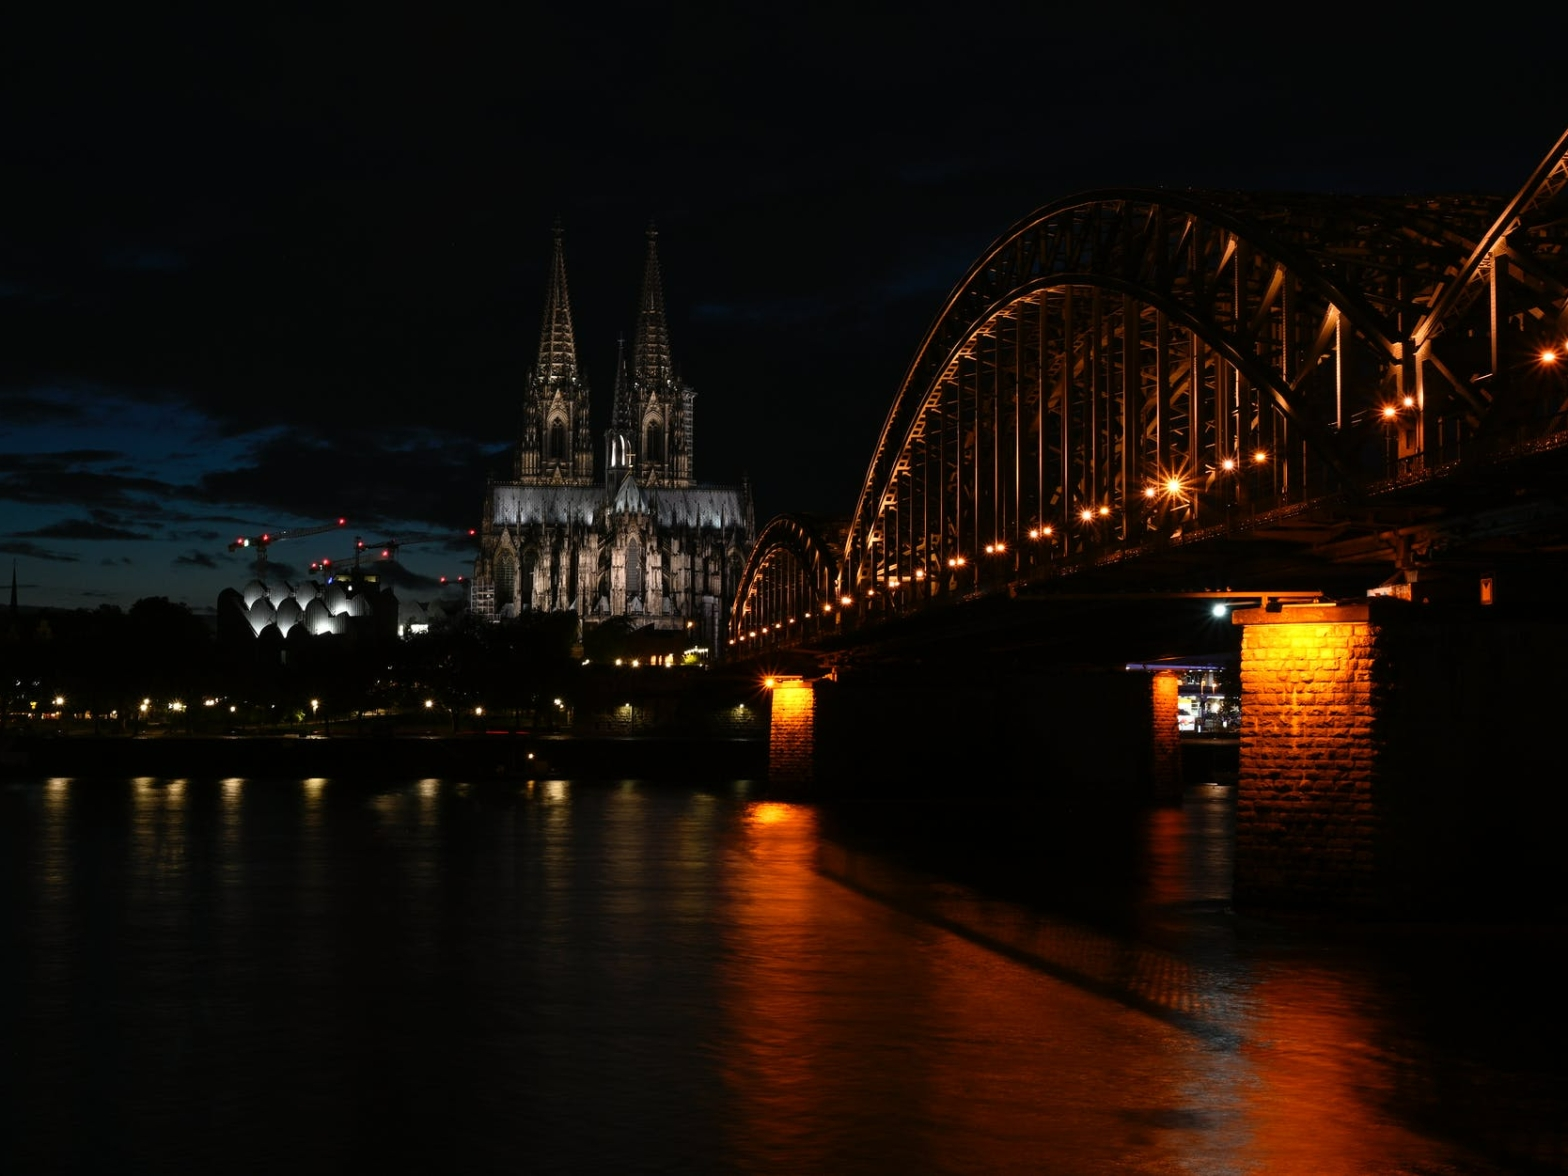 Cologne Dom behind the Rhein River, North Rhine-Westphalia, Germany